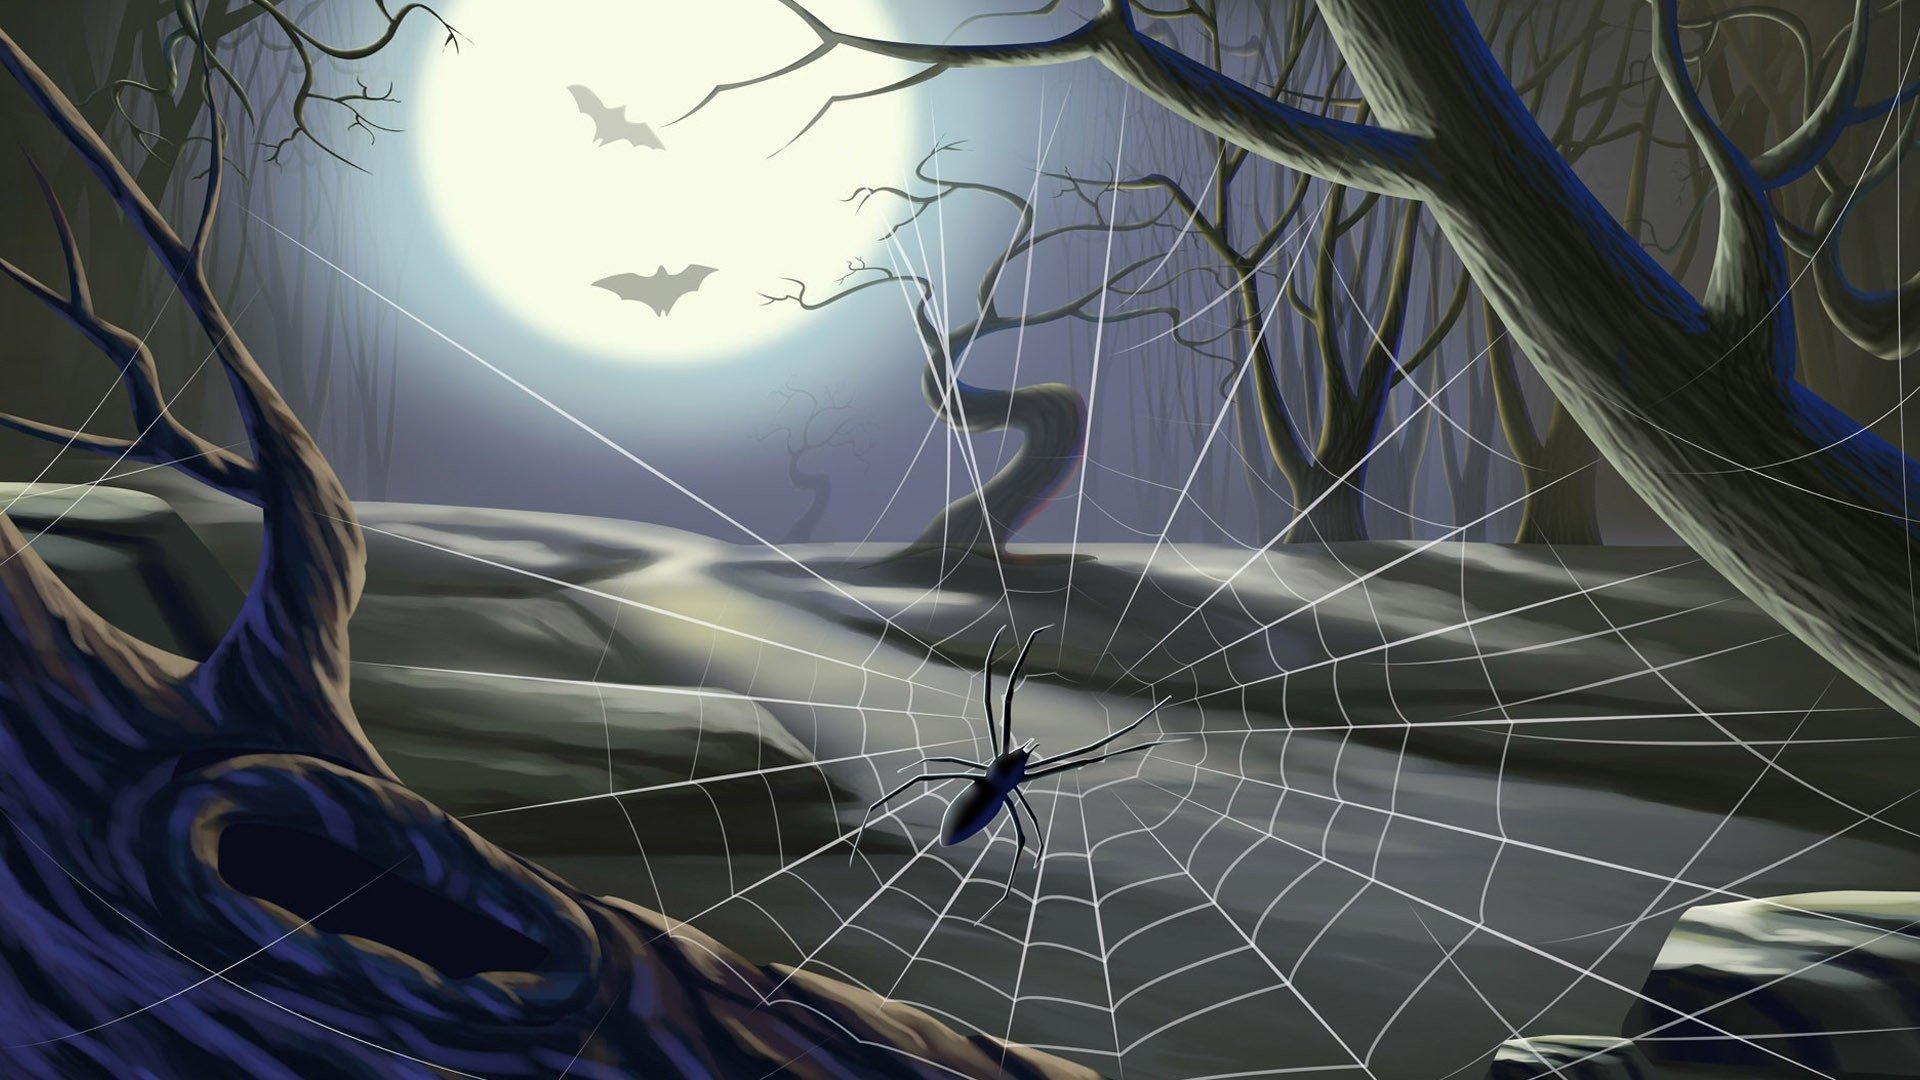 spider-web-tree-bat-moon-halloween